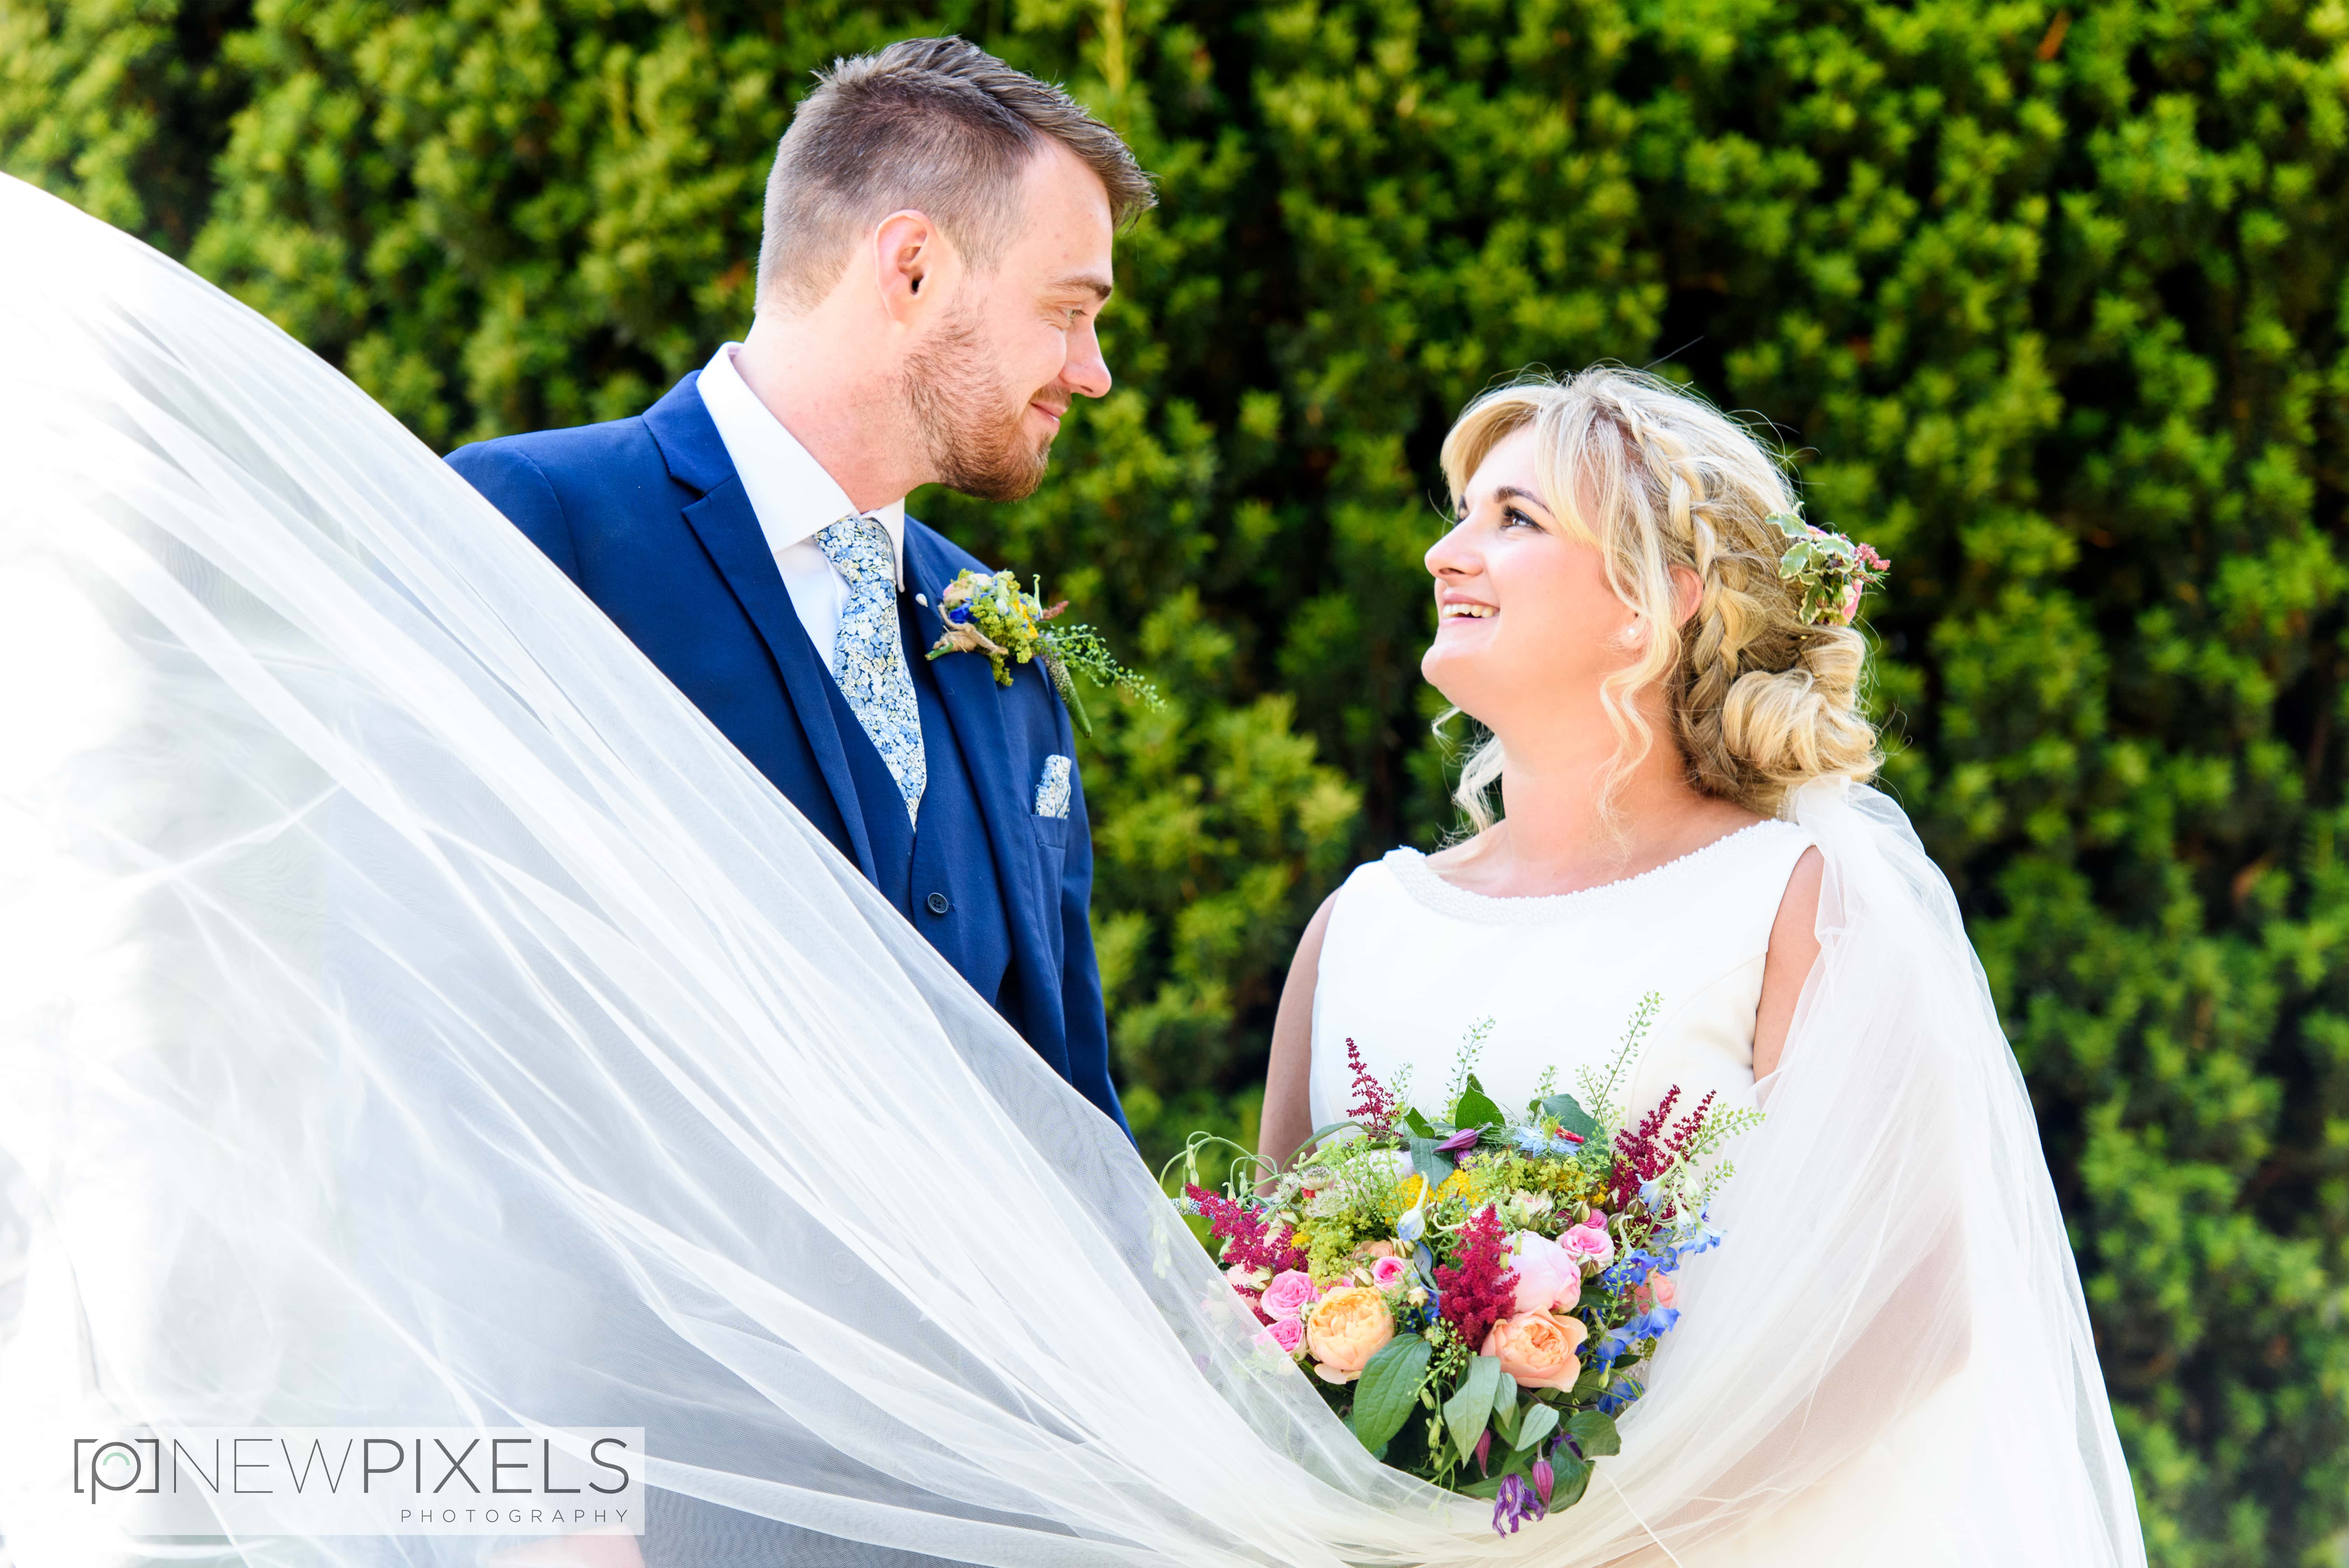 Hertfordshire wedding photographer of the year